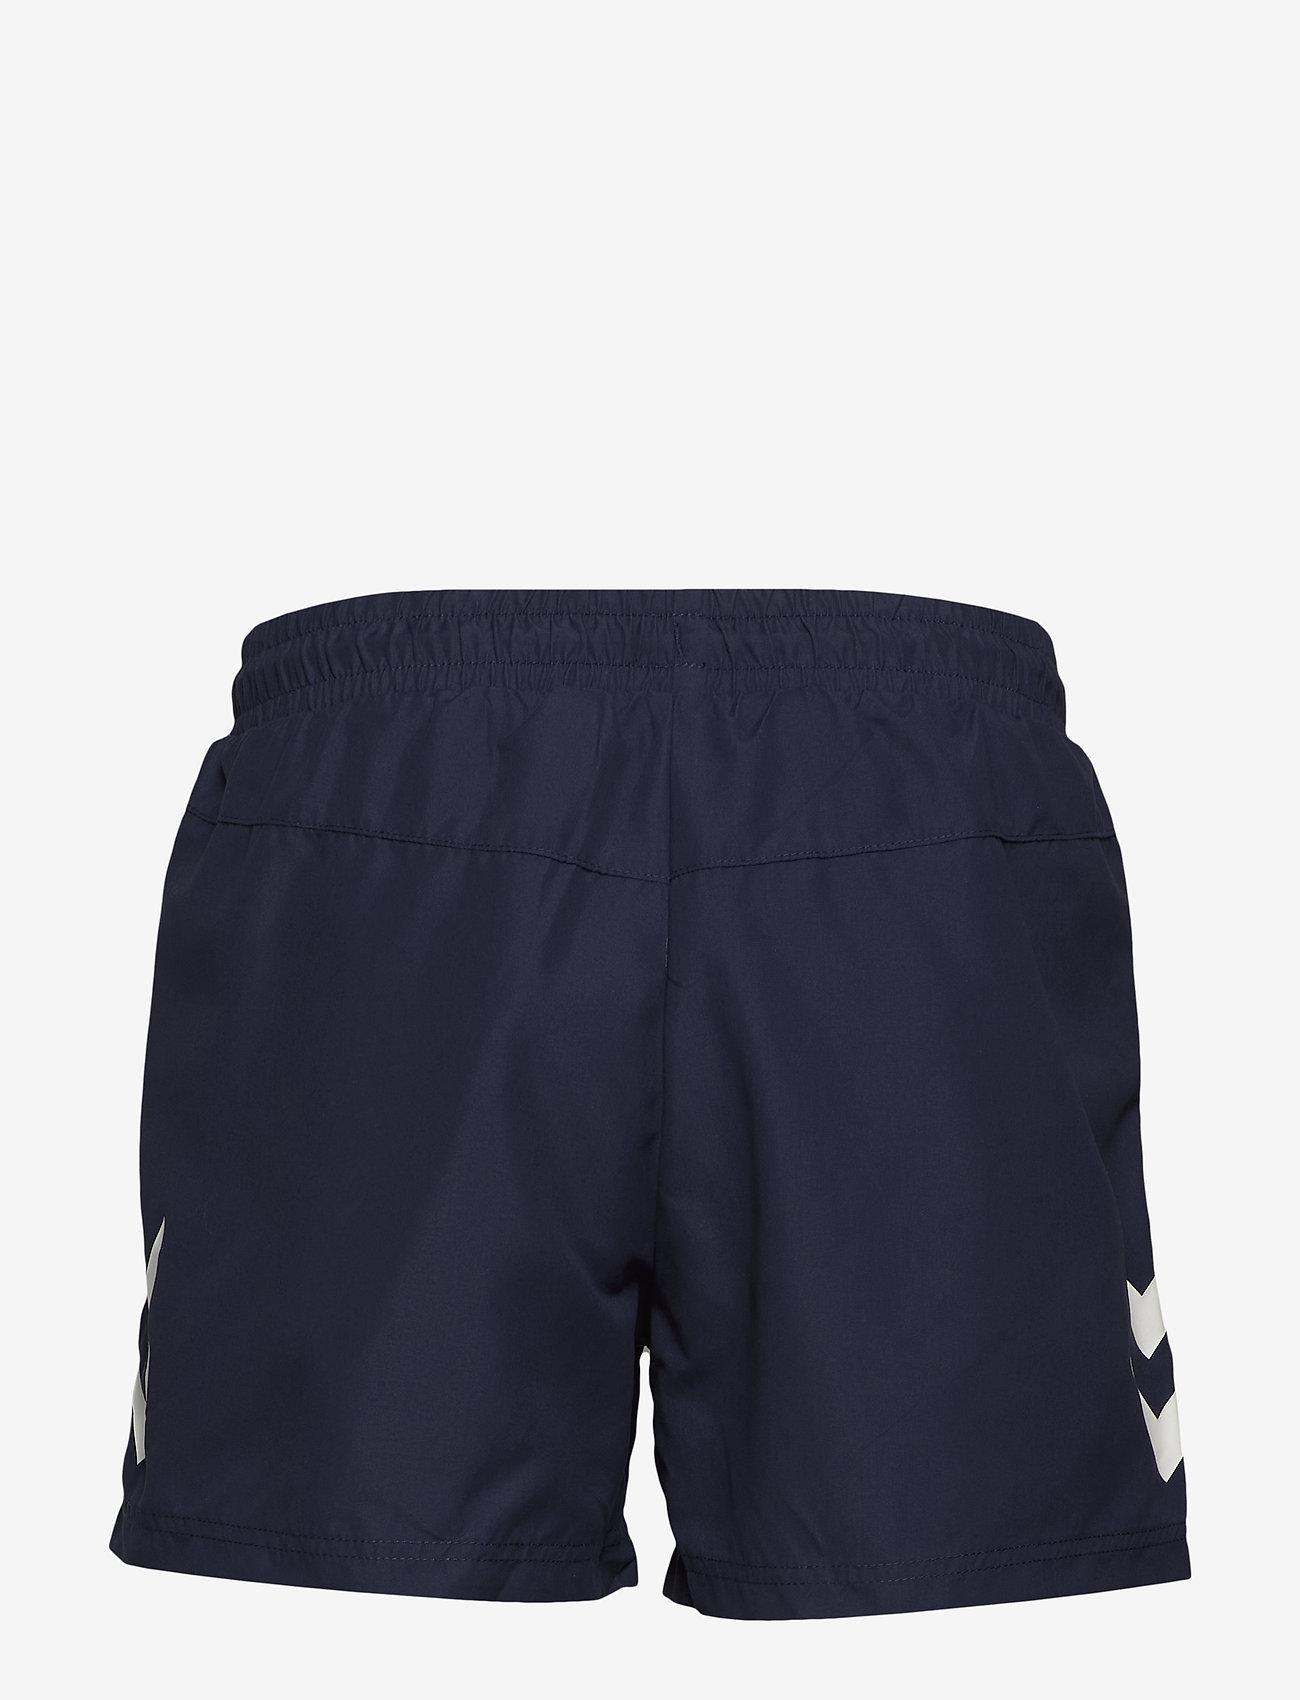 Hummel - hmlRENCE BOARD SHORTS - shorts - peacoat - 1